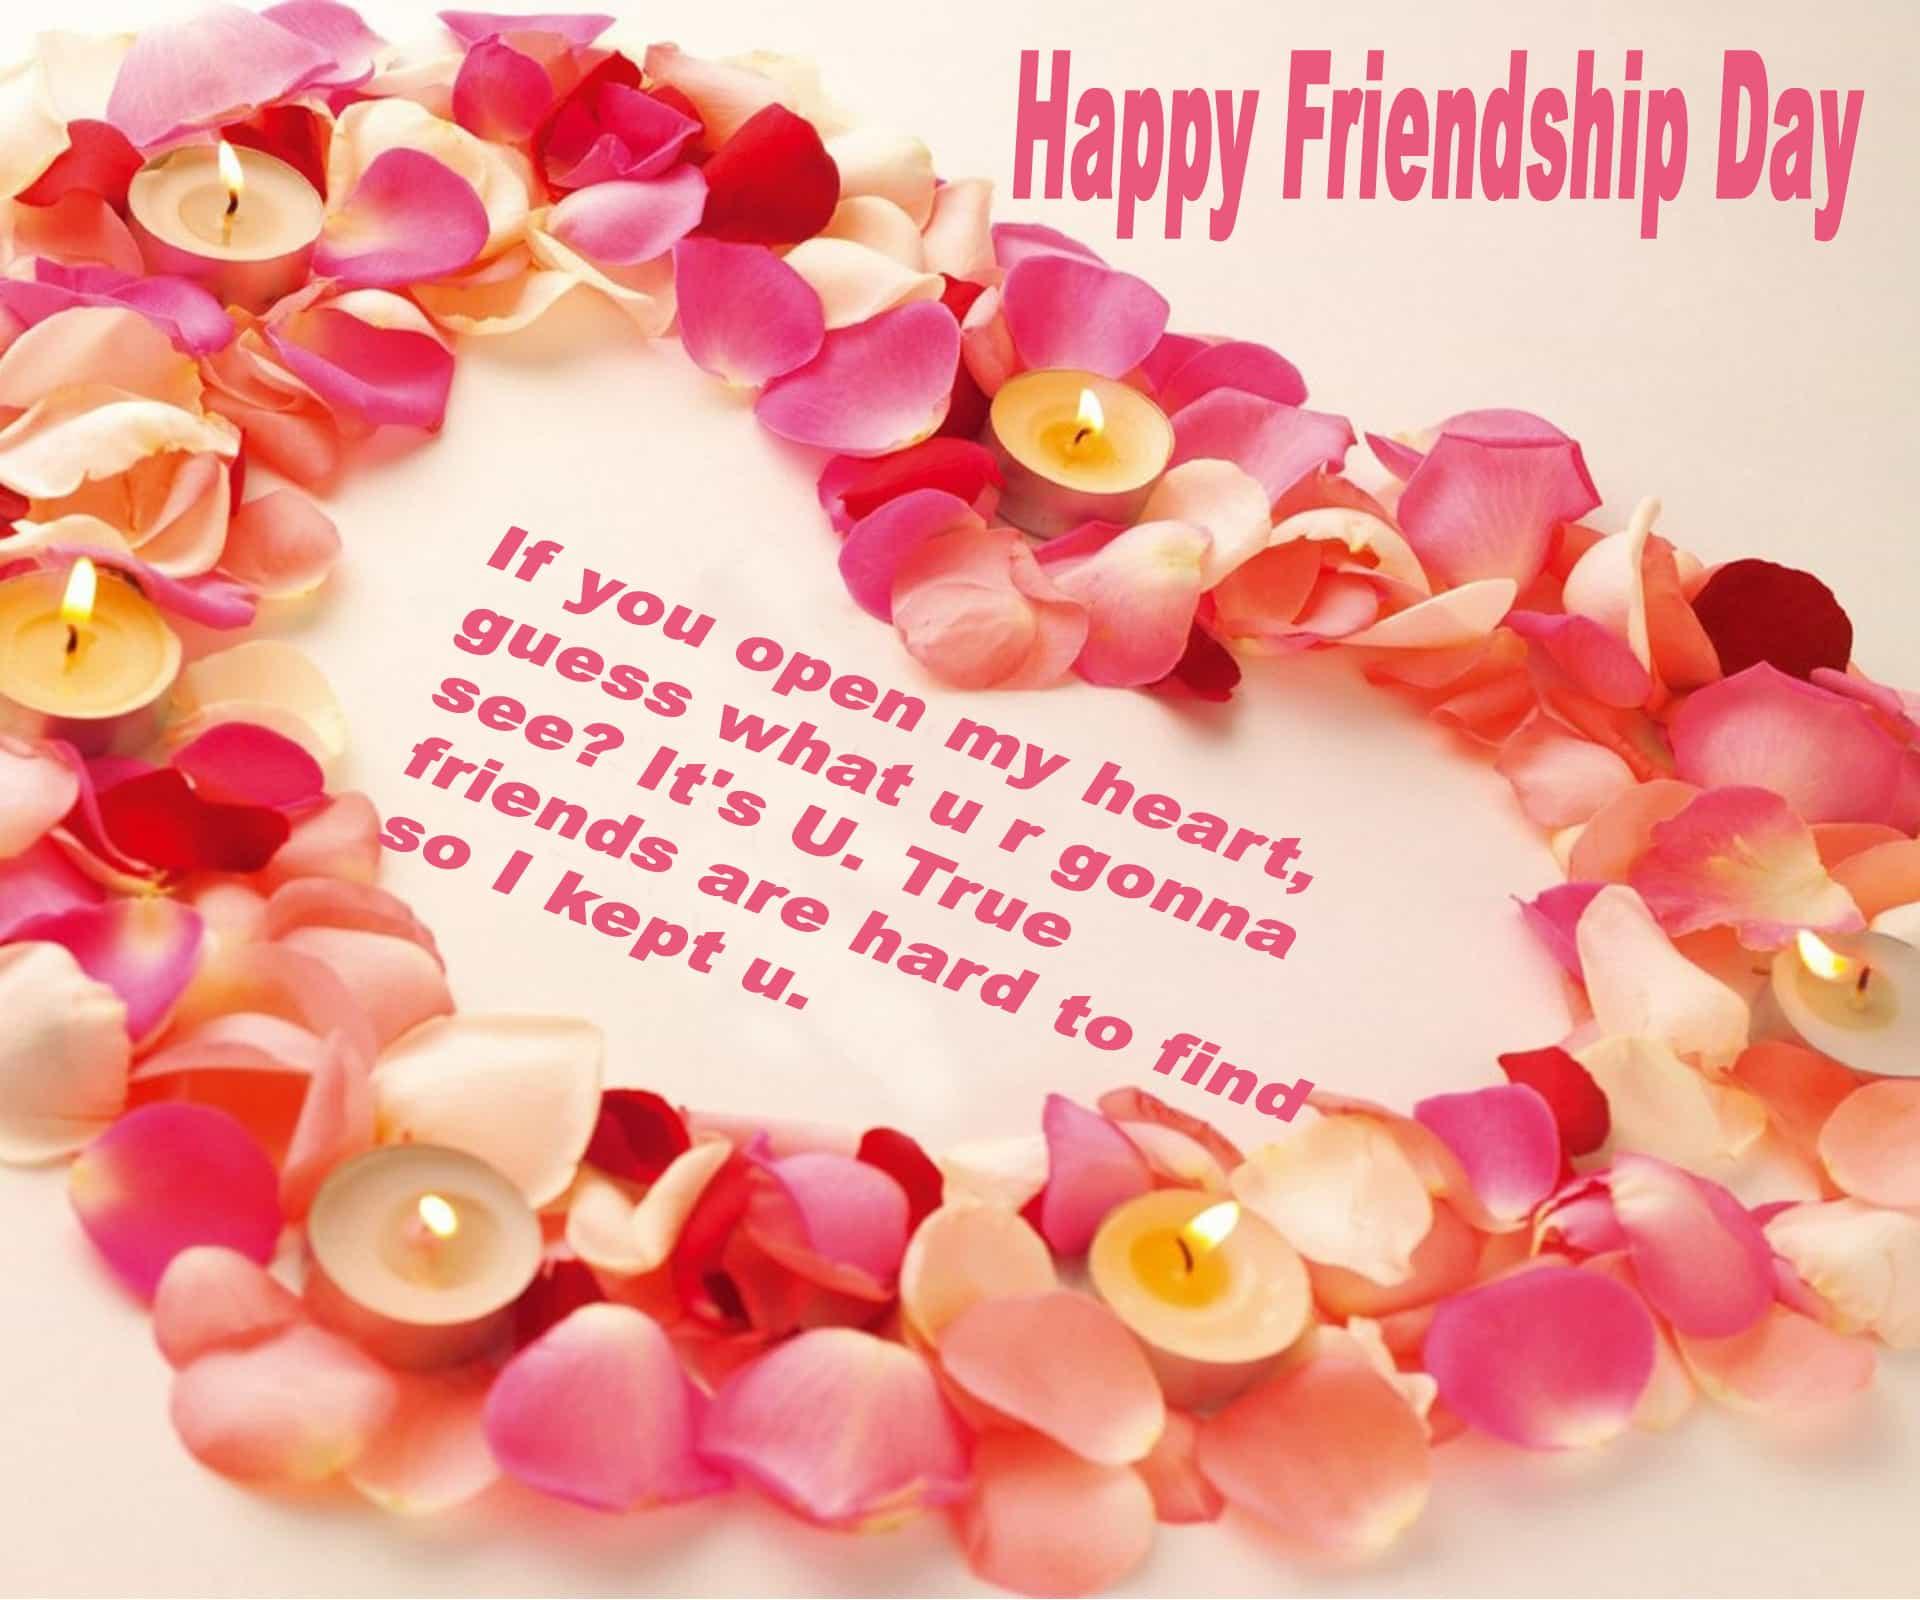 happy friendship day wallpaper for whatsapp